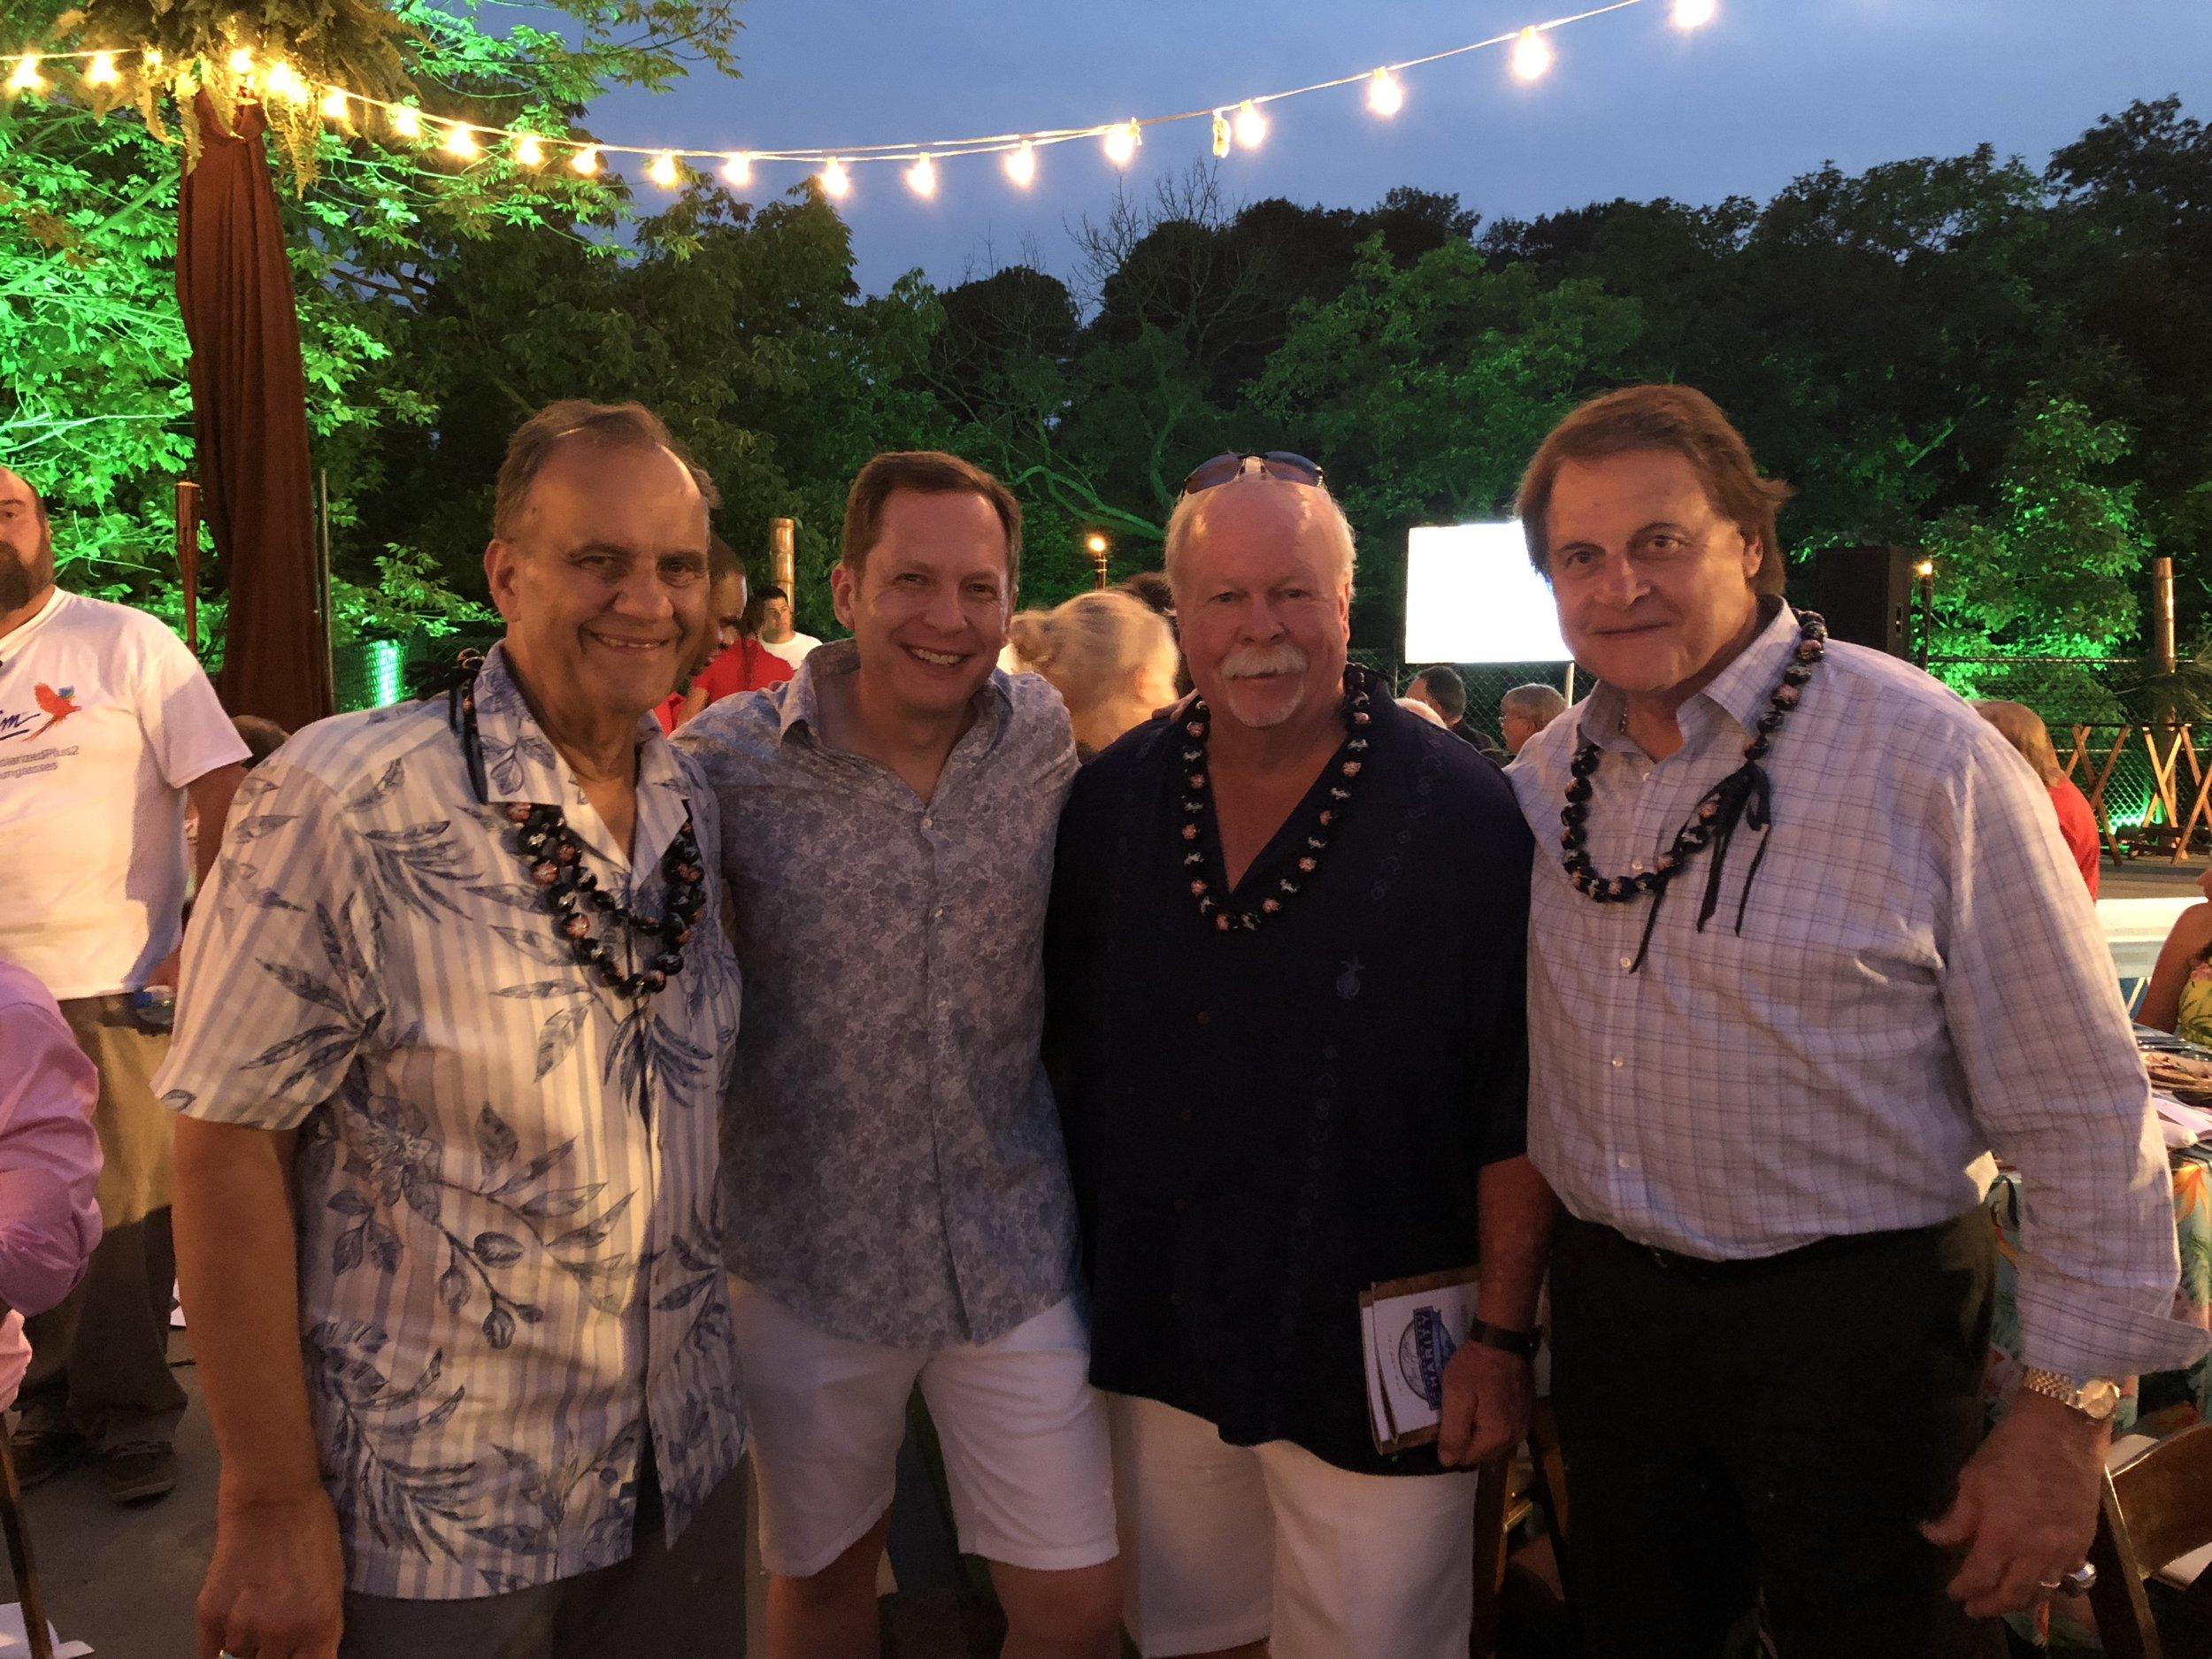 Joe Torre, David Goodman, Craig Stadler, & Tony La Russa